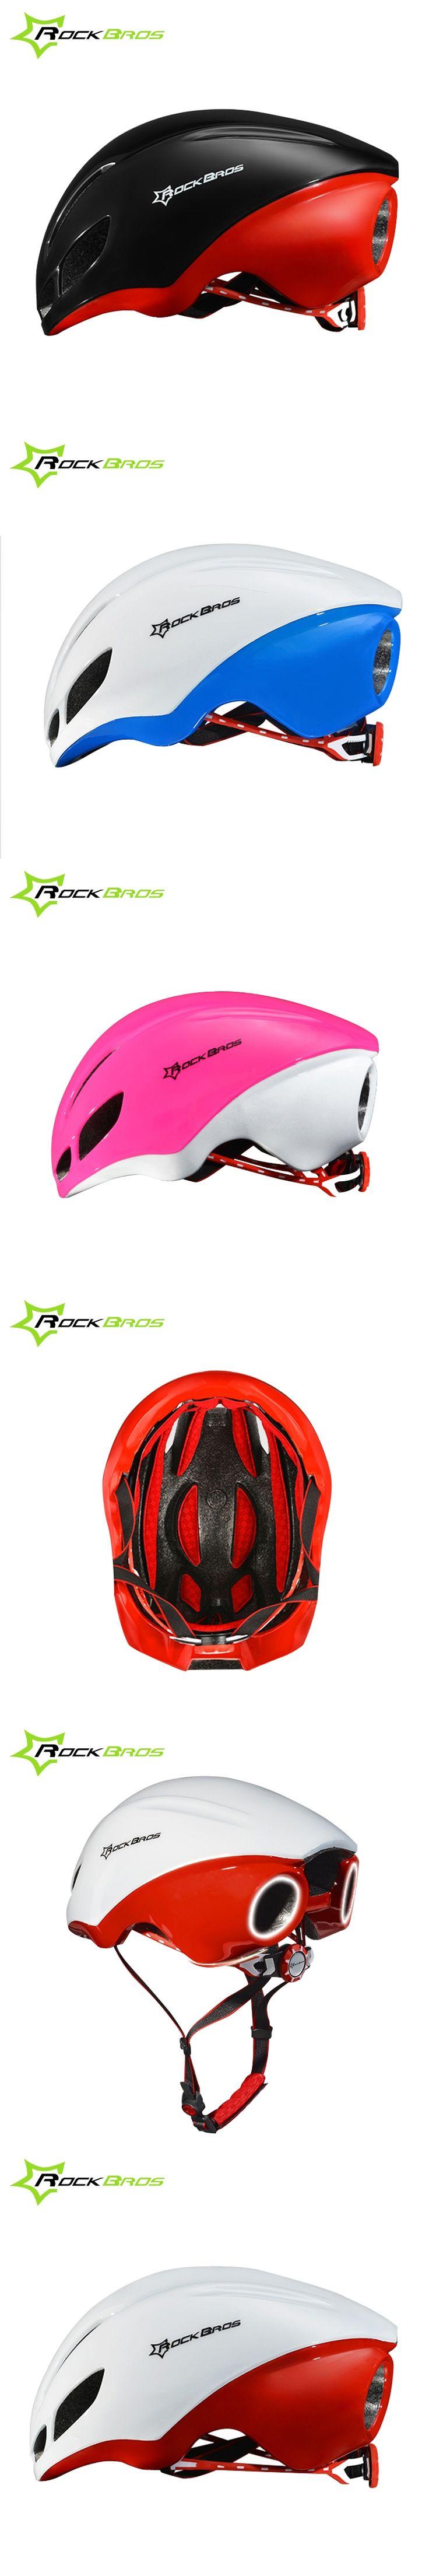 ROCKBROS Kask Protone Bike Helmet EPS Bicycle Helmet Bike MTB Cycling Accessories Men Women Integrally-molded Casco Ciclismo